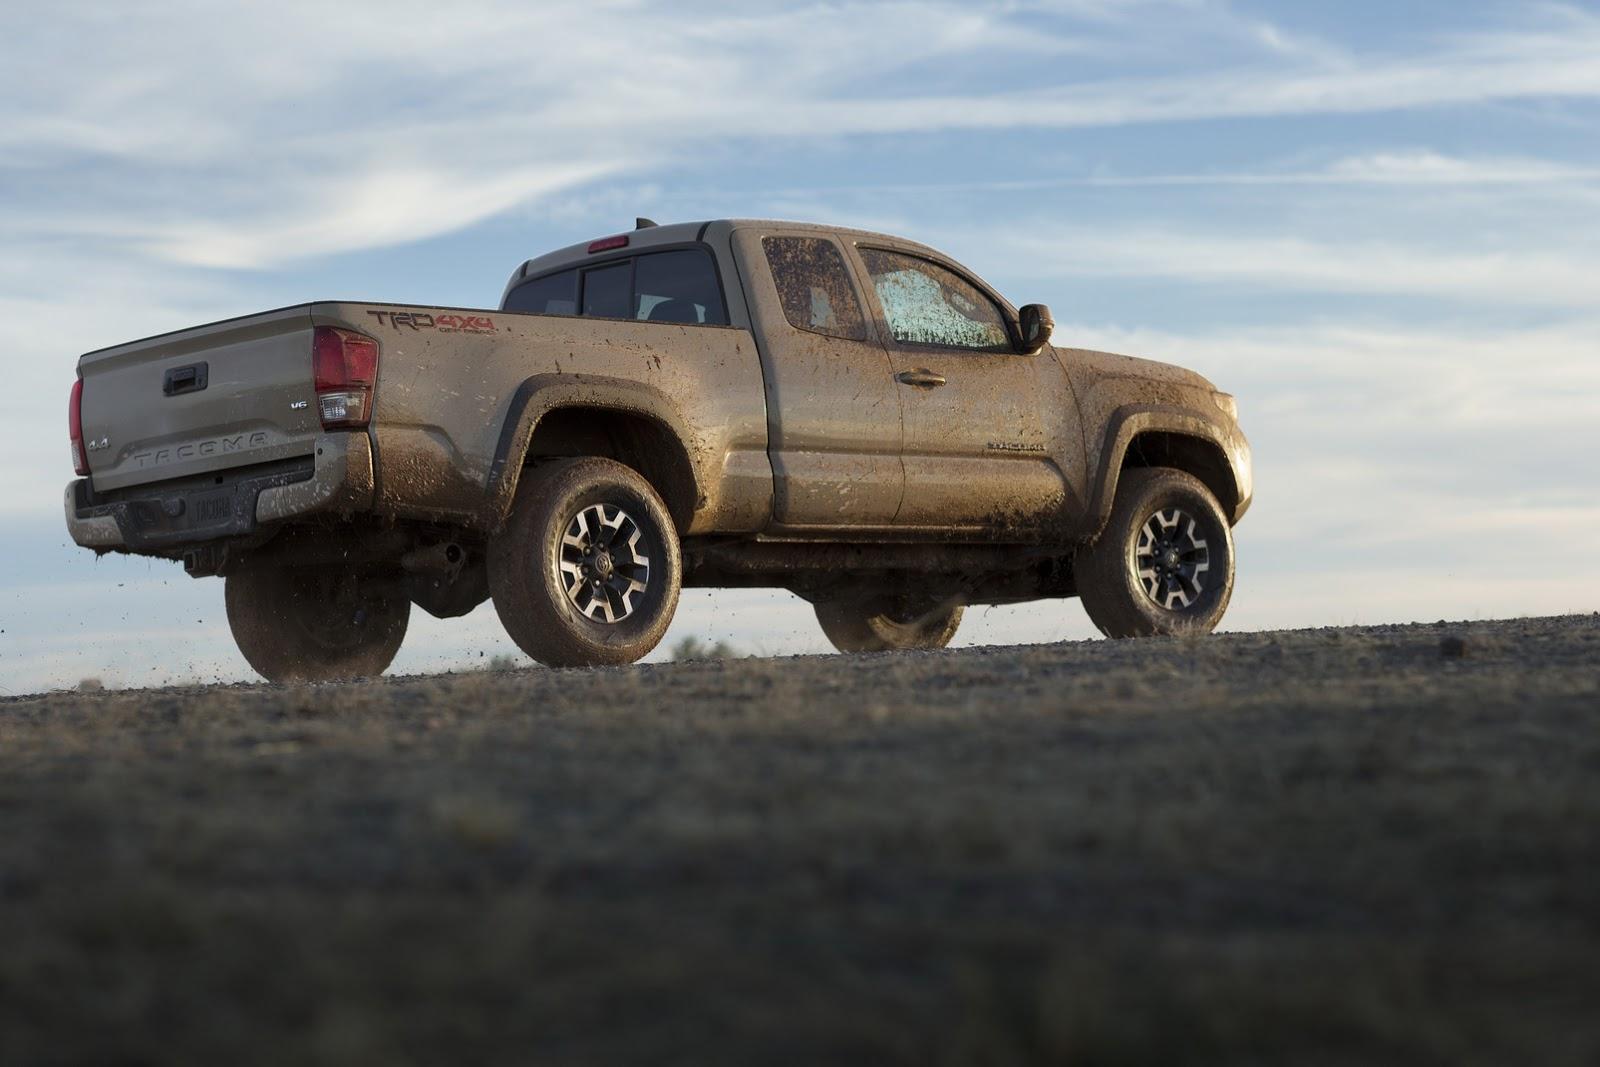 Toyota Details New 2016 Tacoma Pickup Truck 75 Pics